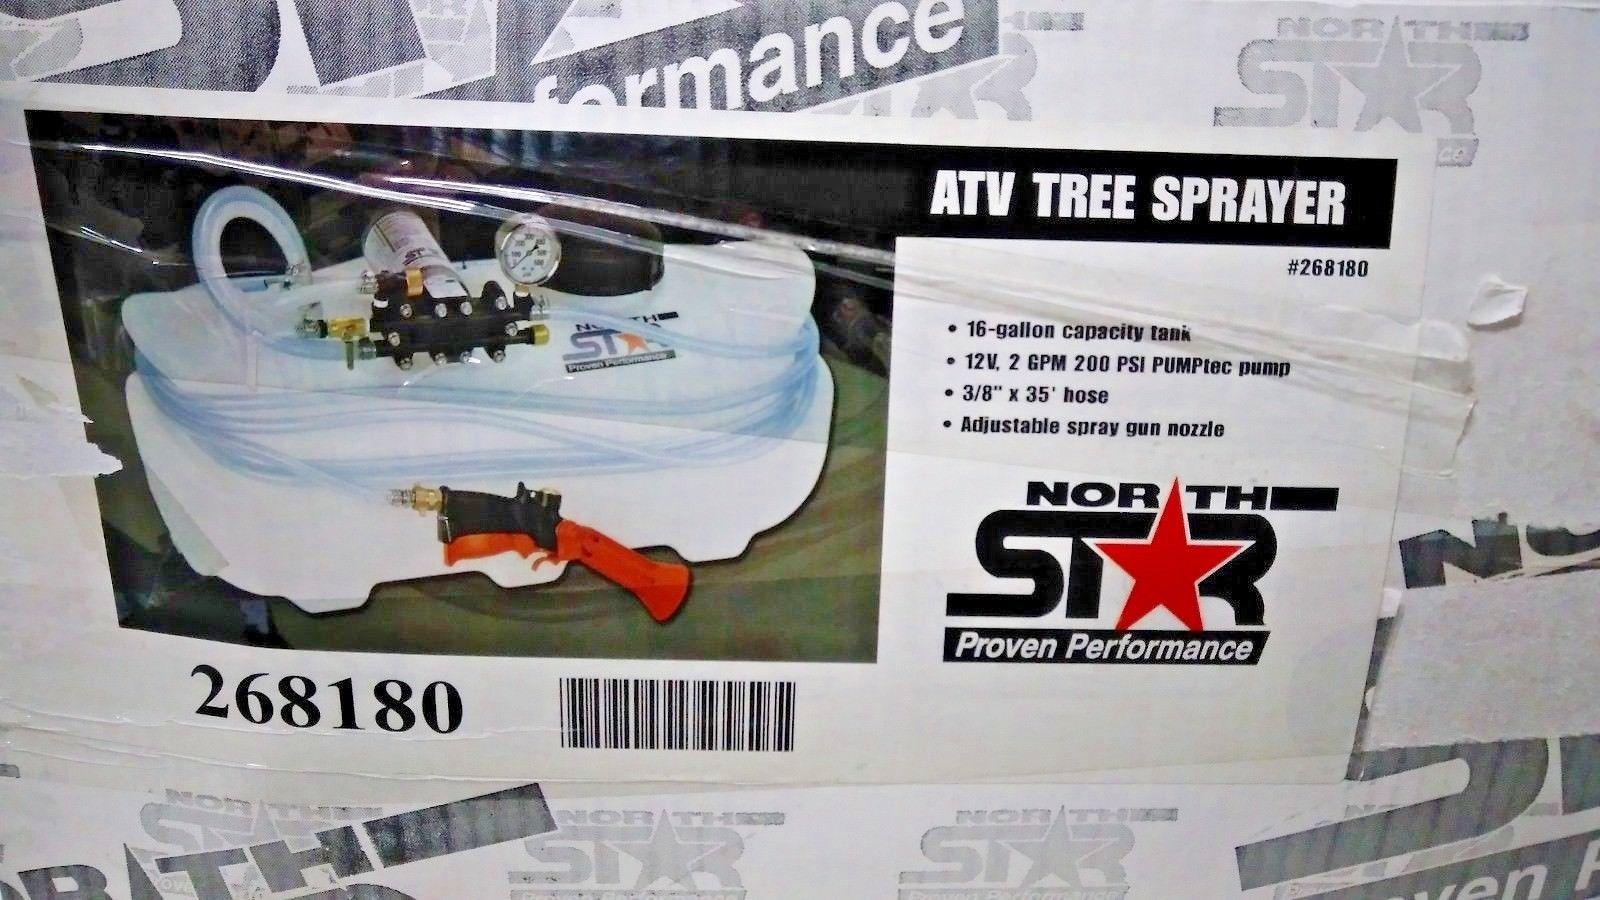 High-Pressure ATV Tree Sprayer — 16 Gallon, 2 GPM, 12 Volt